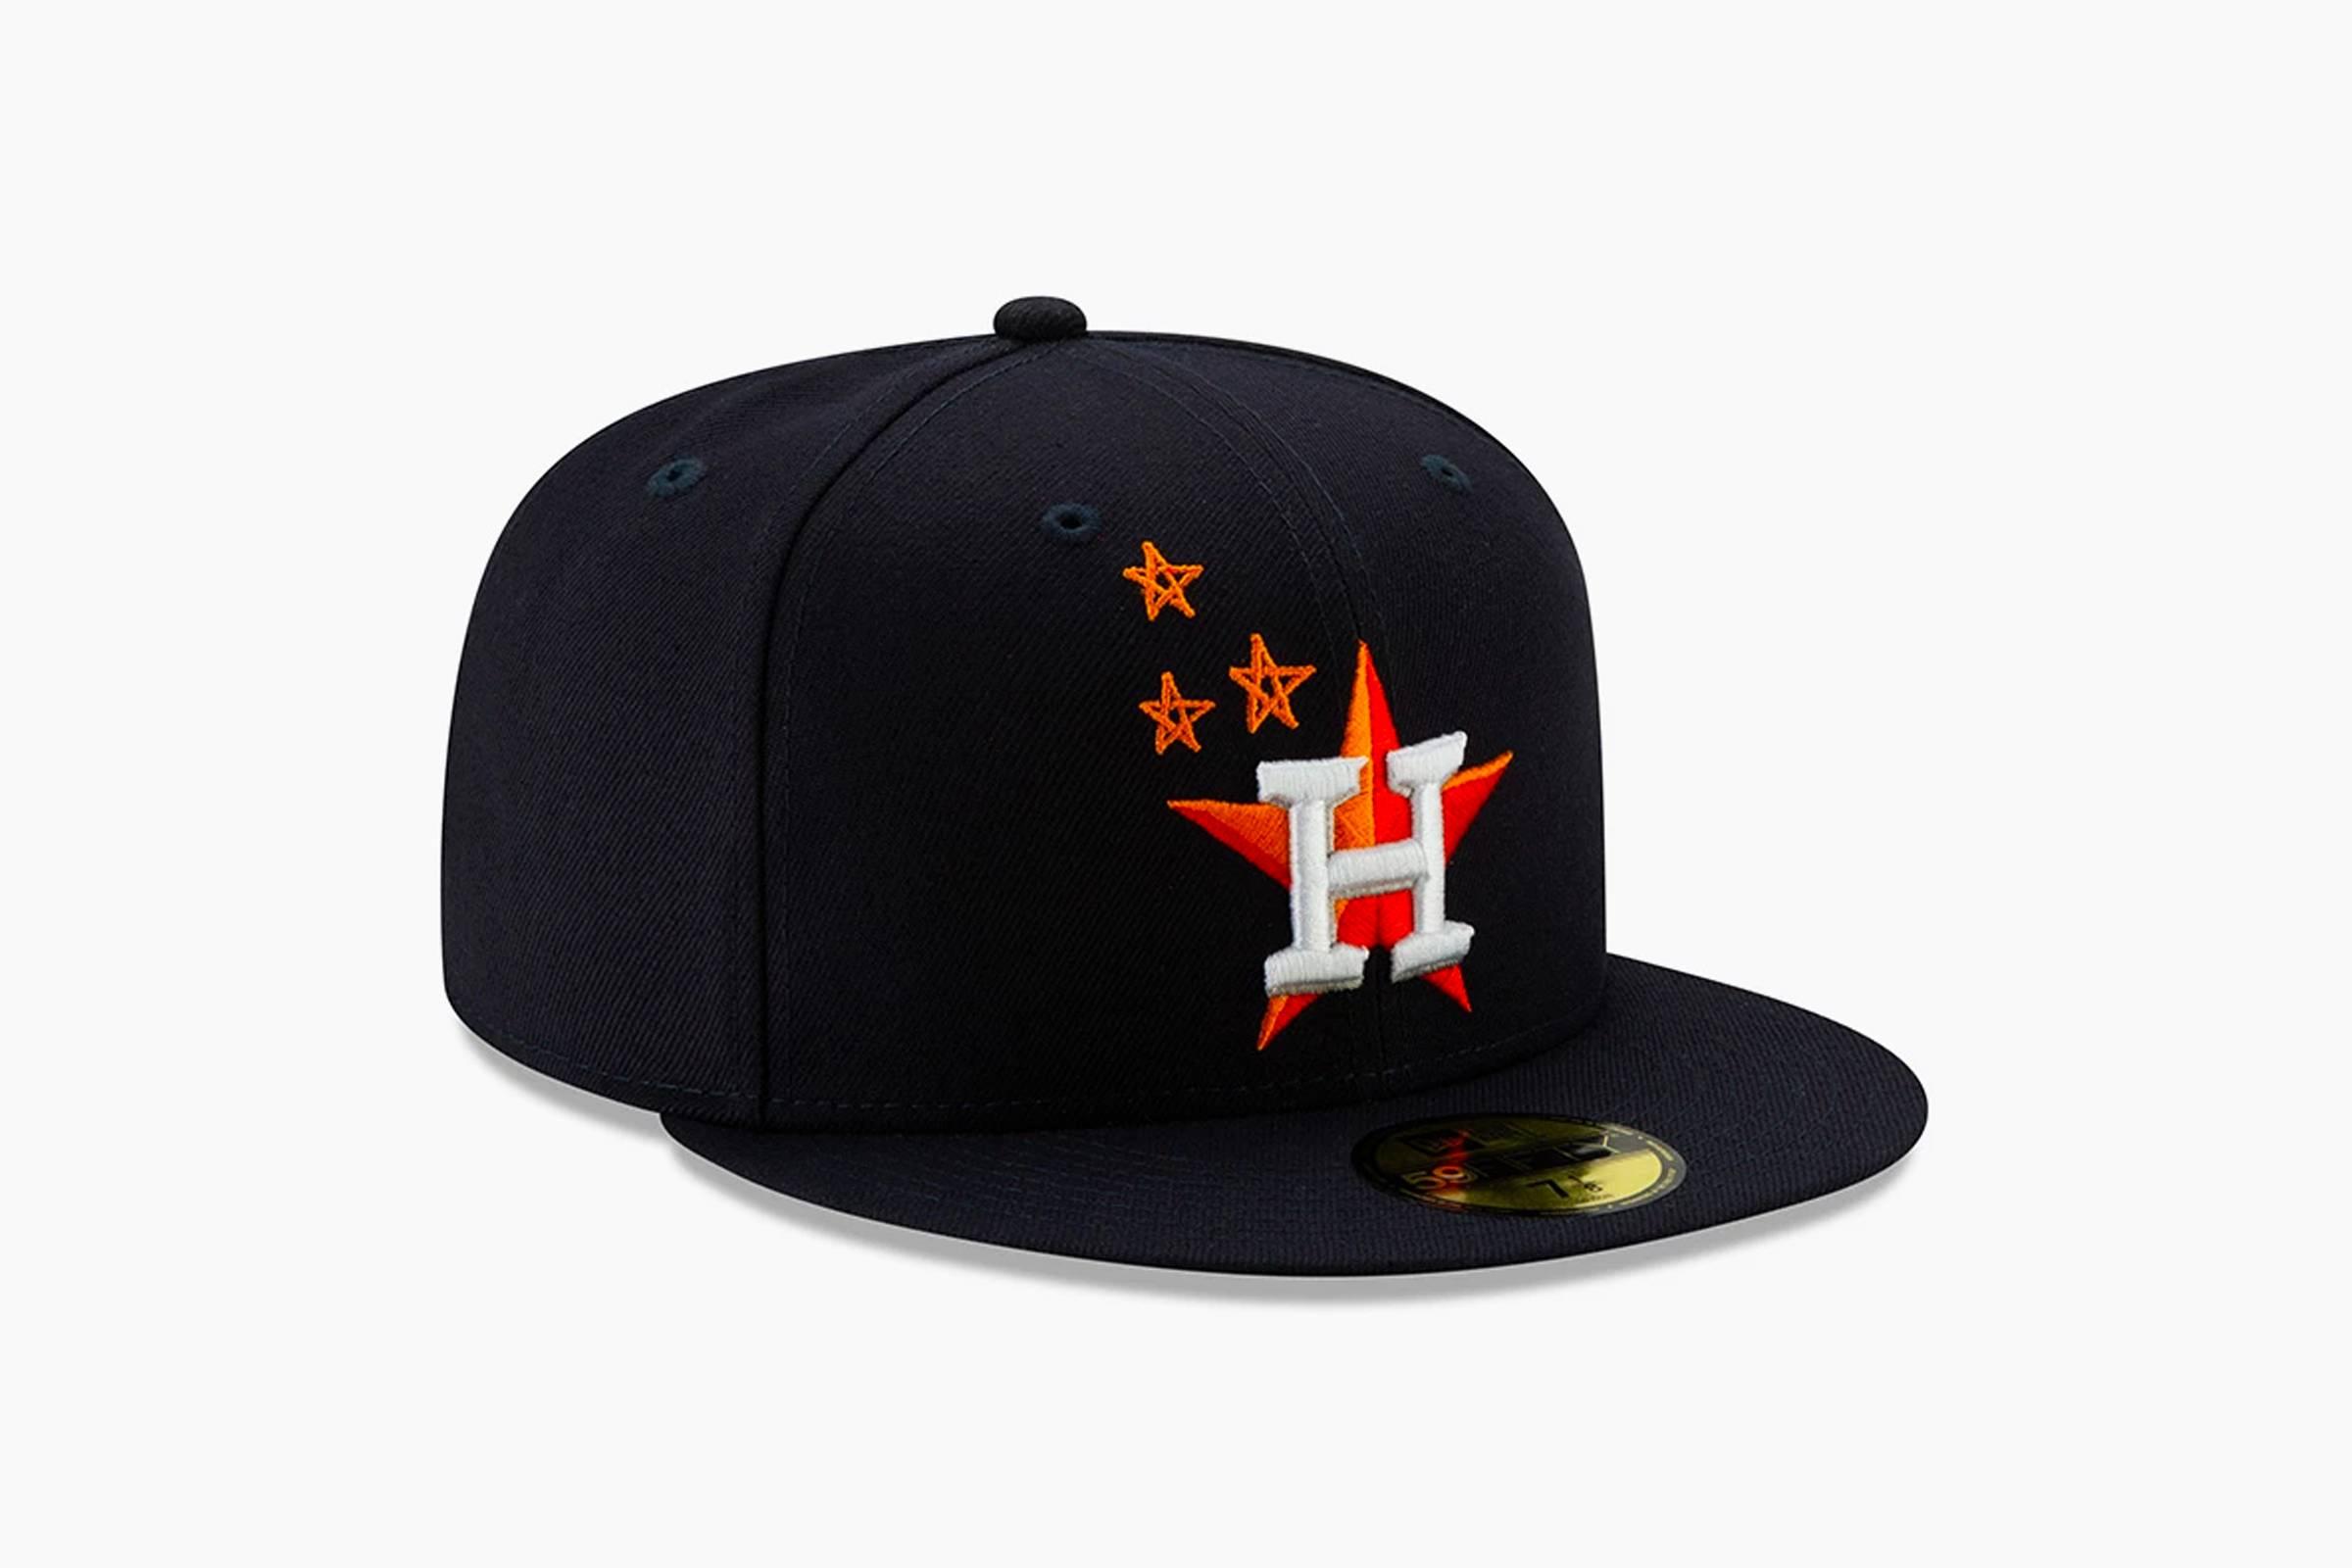 New Era Houston Astros Hat (2019)